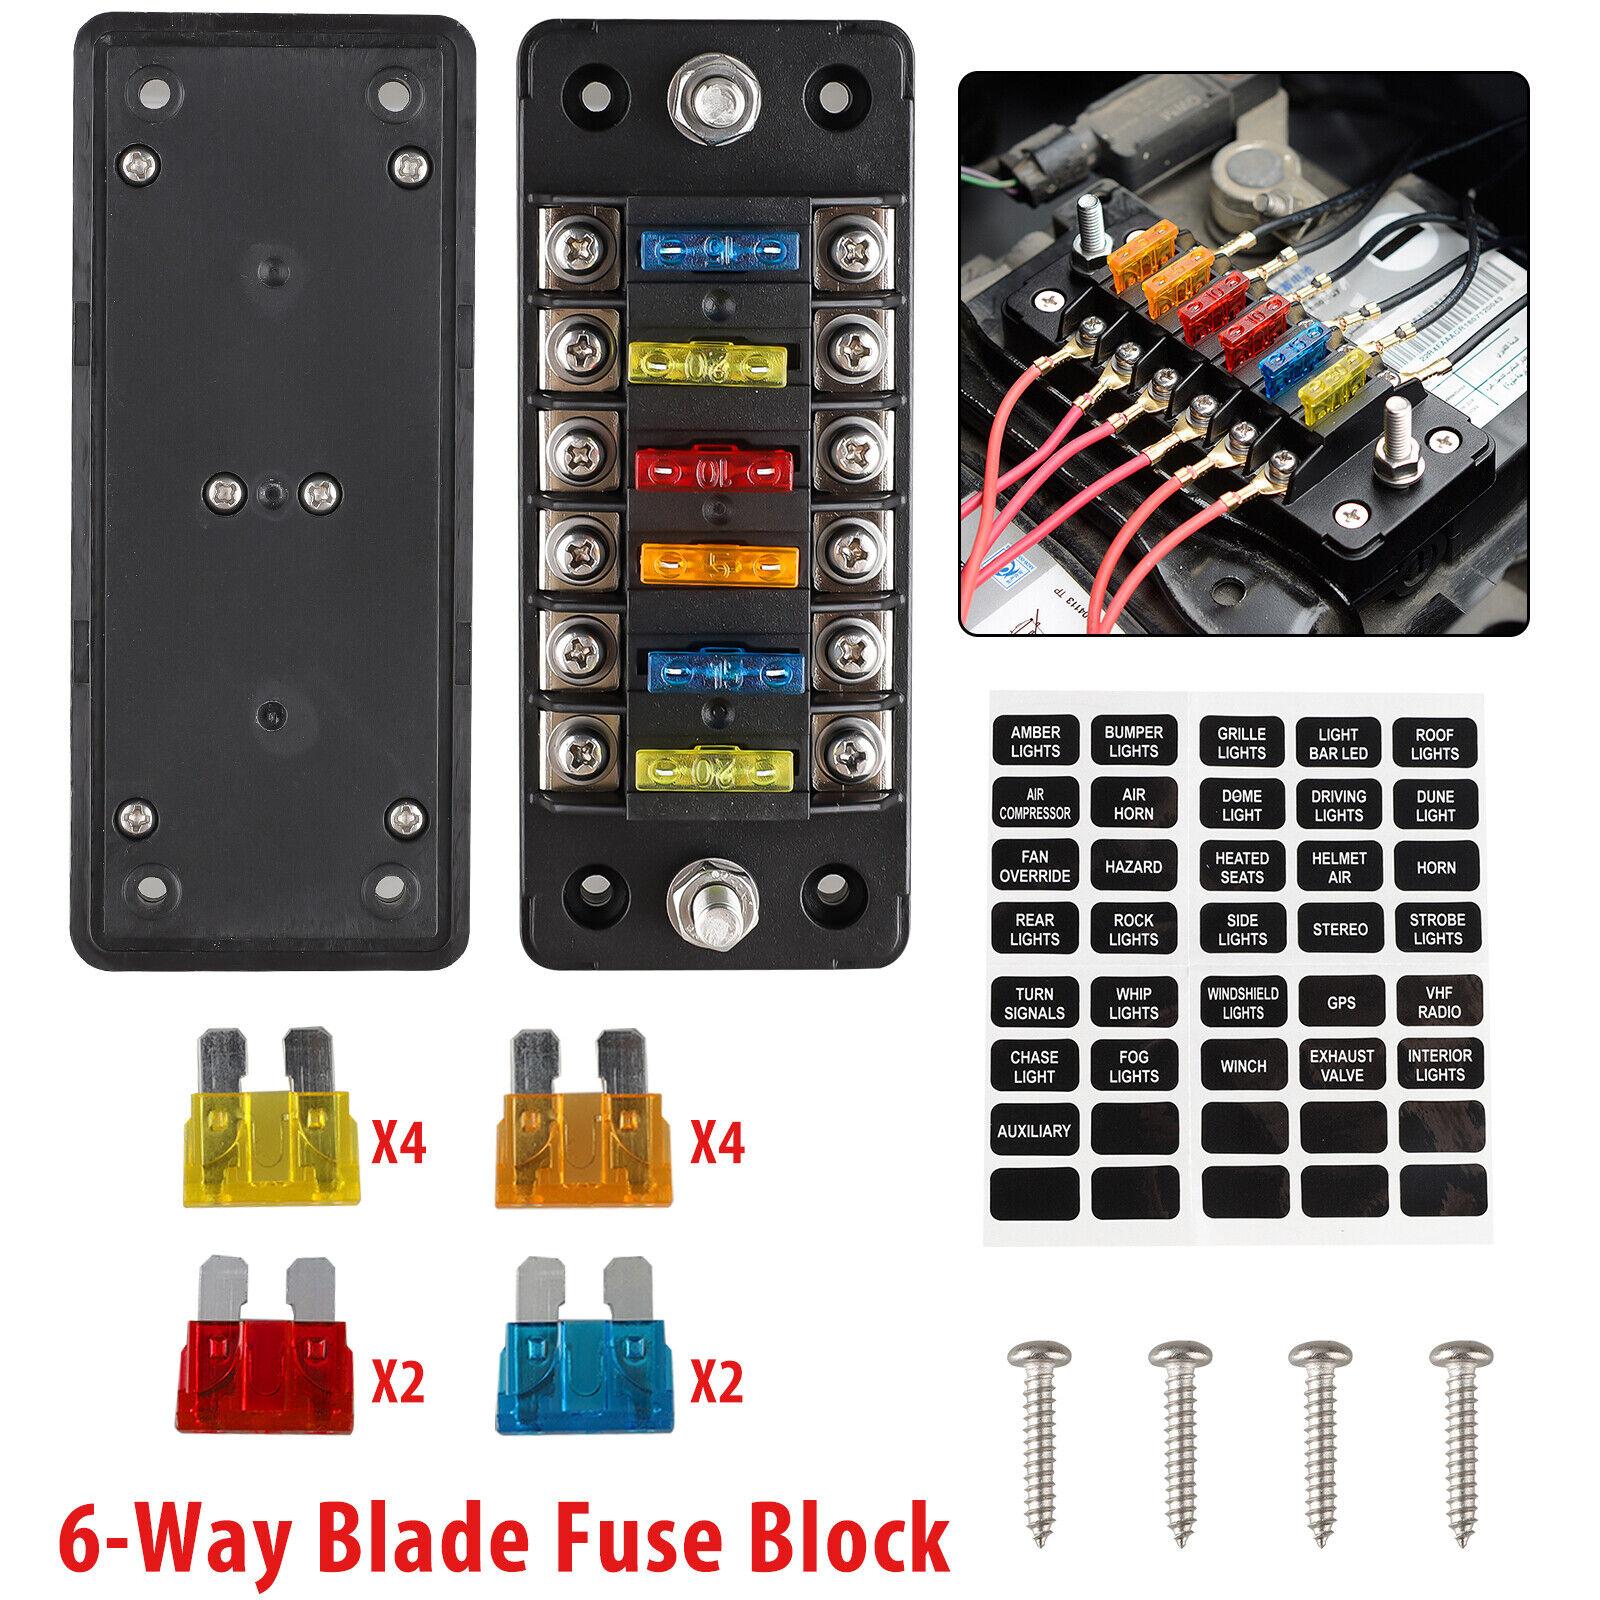 32v 100a 6 Circuit Way LED Blade Fuse Block Holder Indicator W/cover  Sticker for sale online | eBayeBay